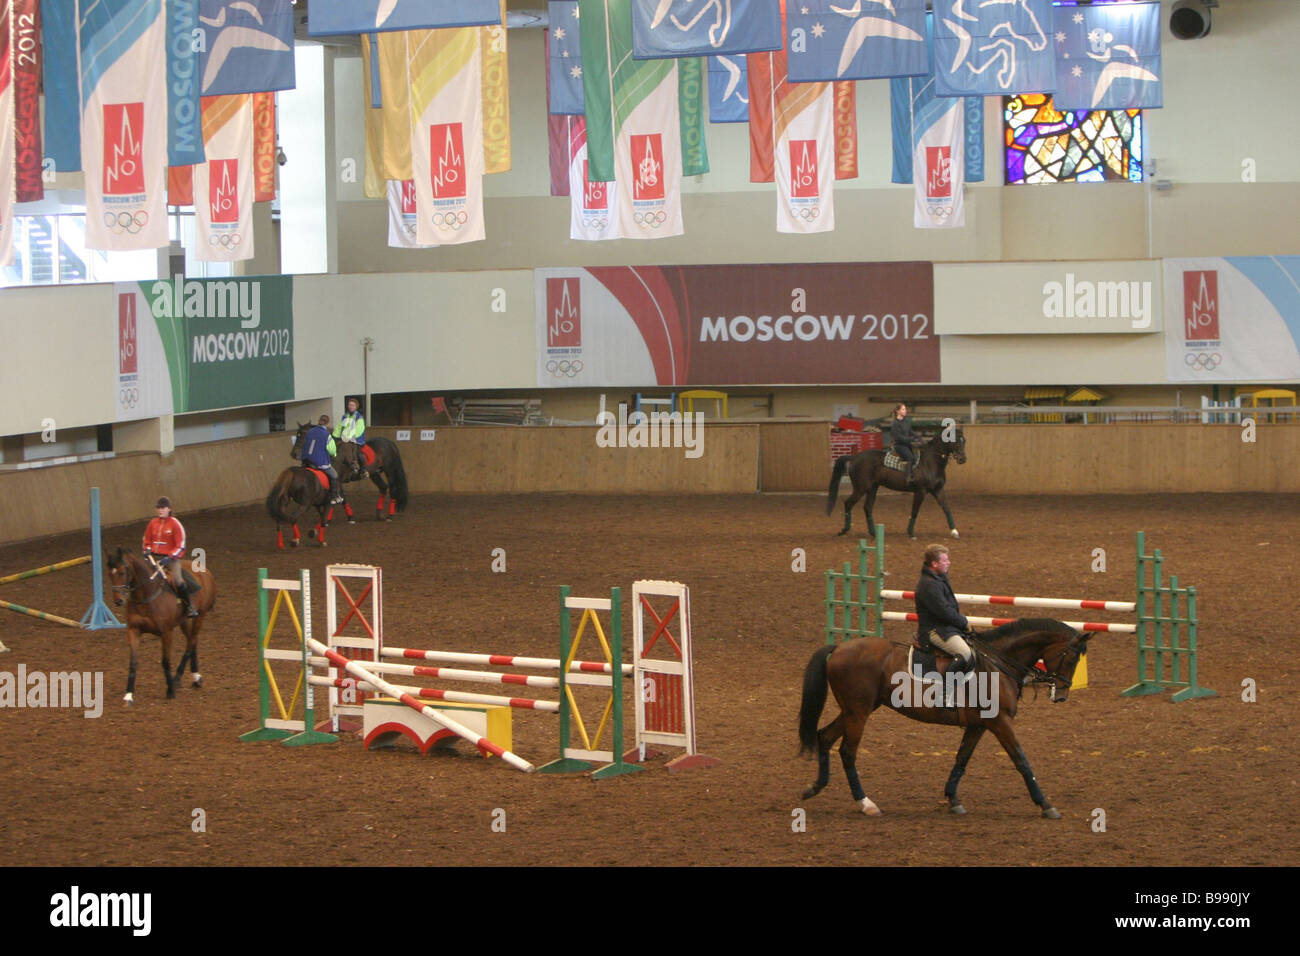 The Bitsa equestrian sports center - Stock Image